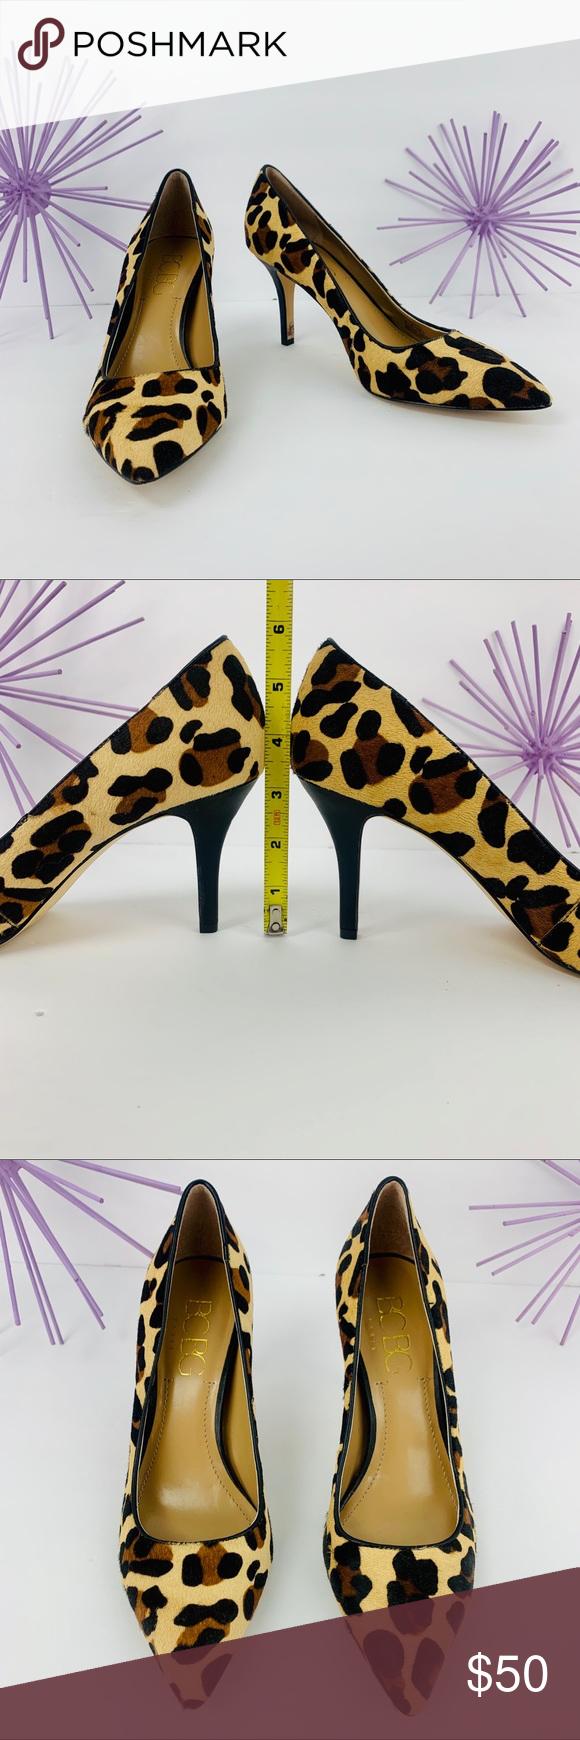 BCBG Paris/Cow Hair Animal Cheetah Cream Tan Black NWOT... BCBG Paris PL-GAMINKA , Cream , Black and Brown animal, cheetah print made with cow hair fur. Man made sole and lining. Smooth black heel.  Size 8 1/2B Heel 3.25 in.  #0706 BCBG Paris Shoes Heels